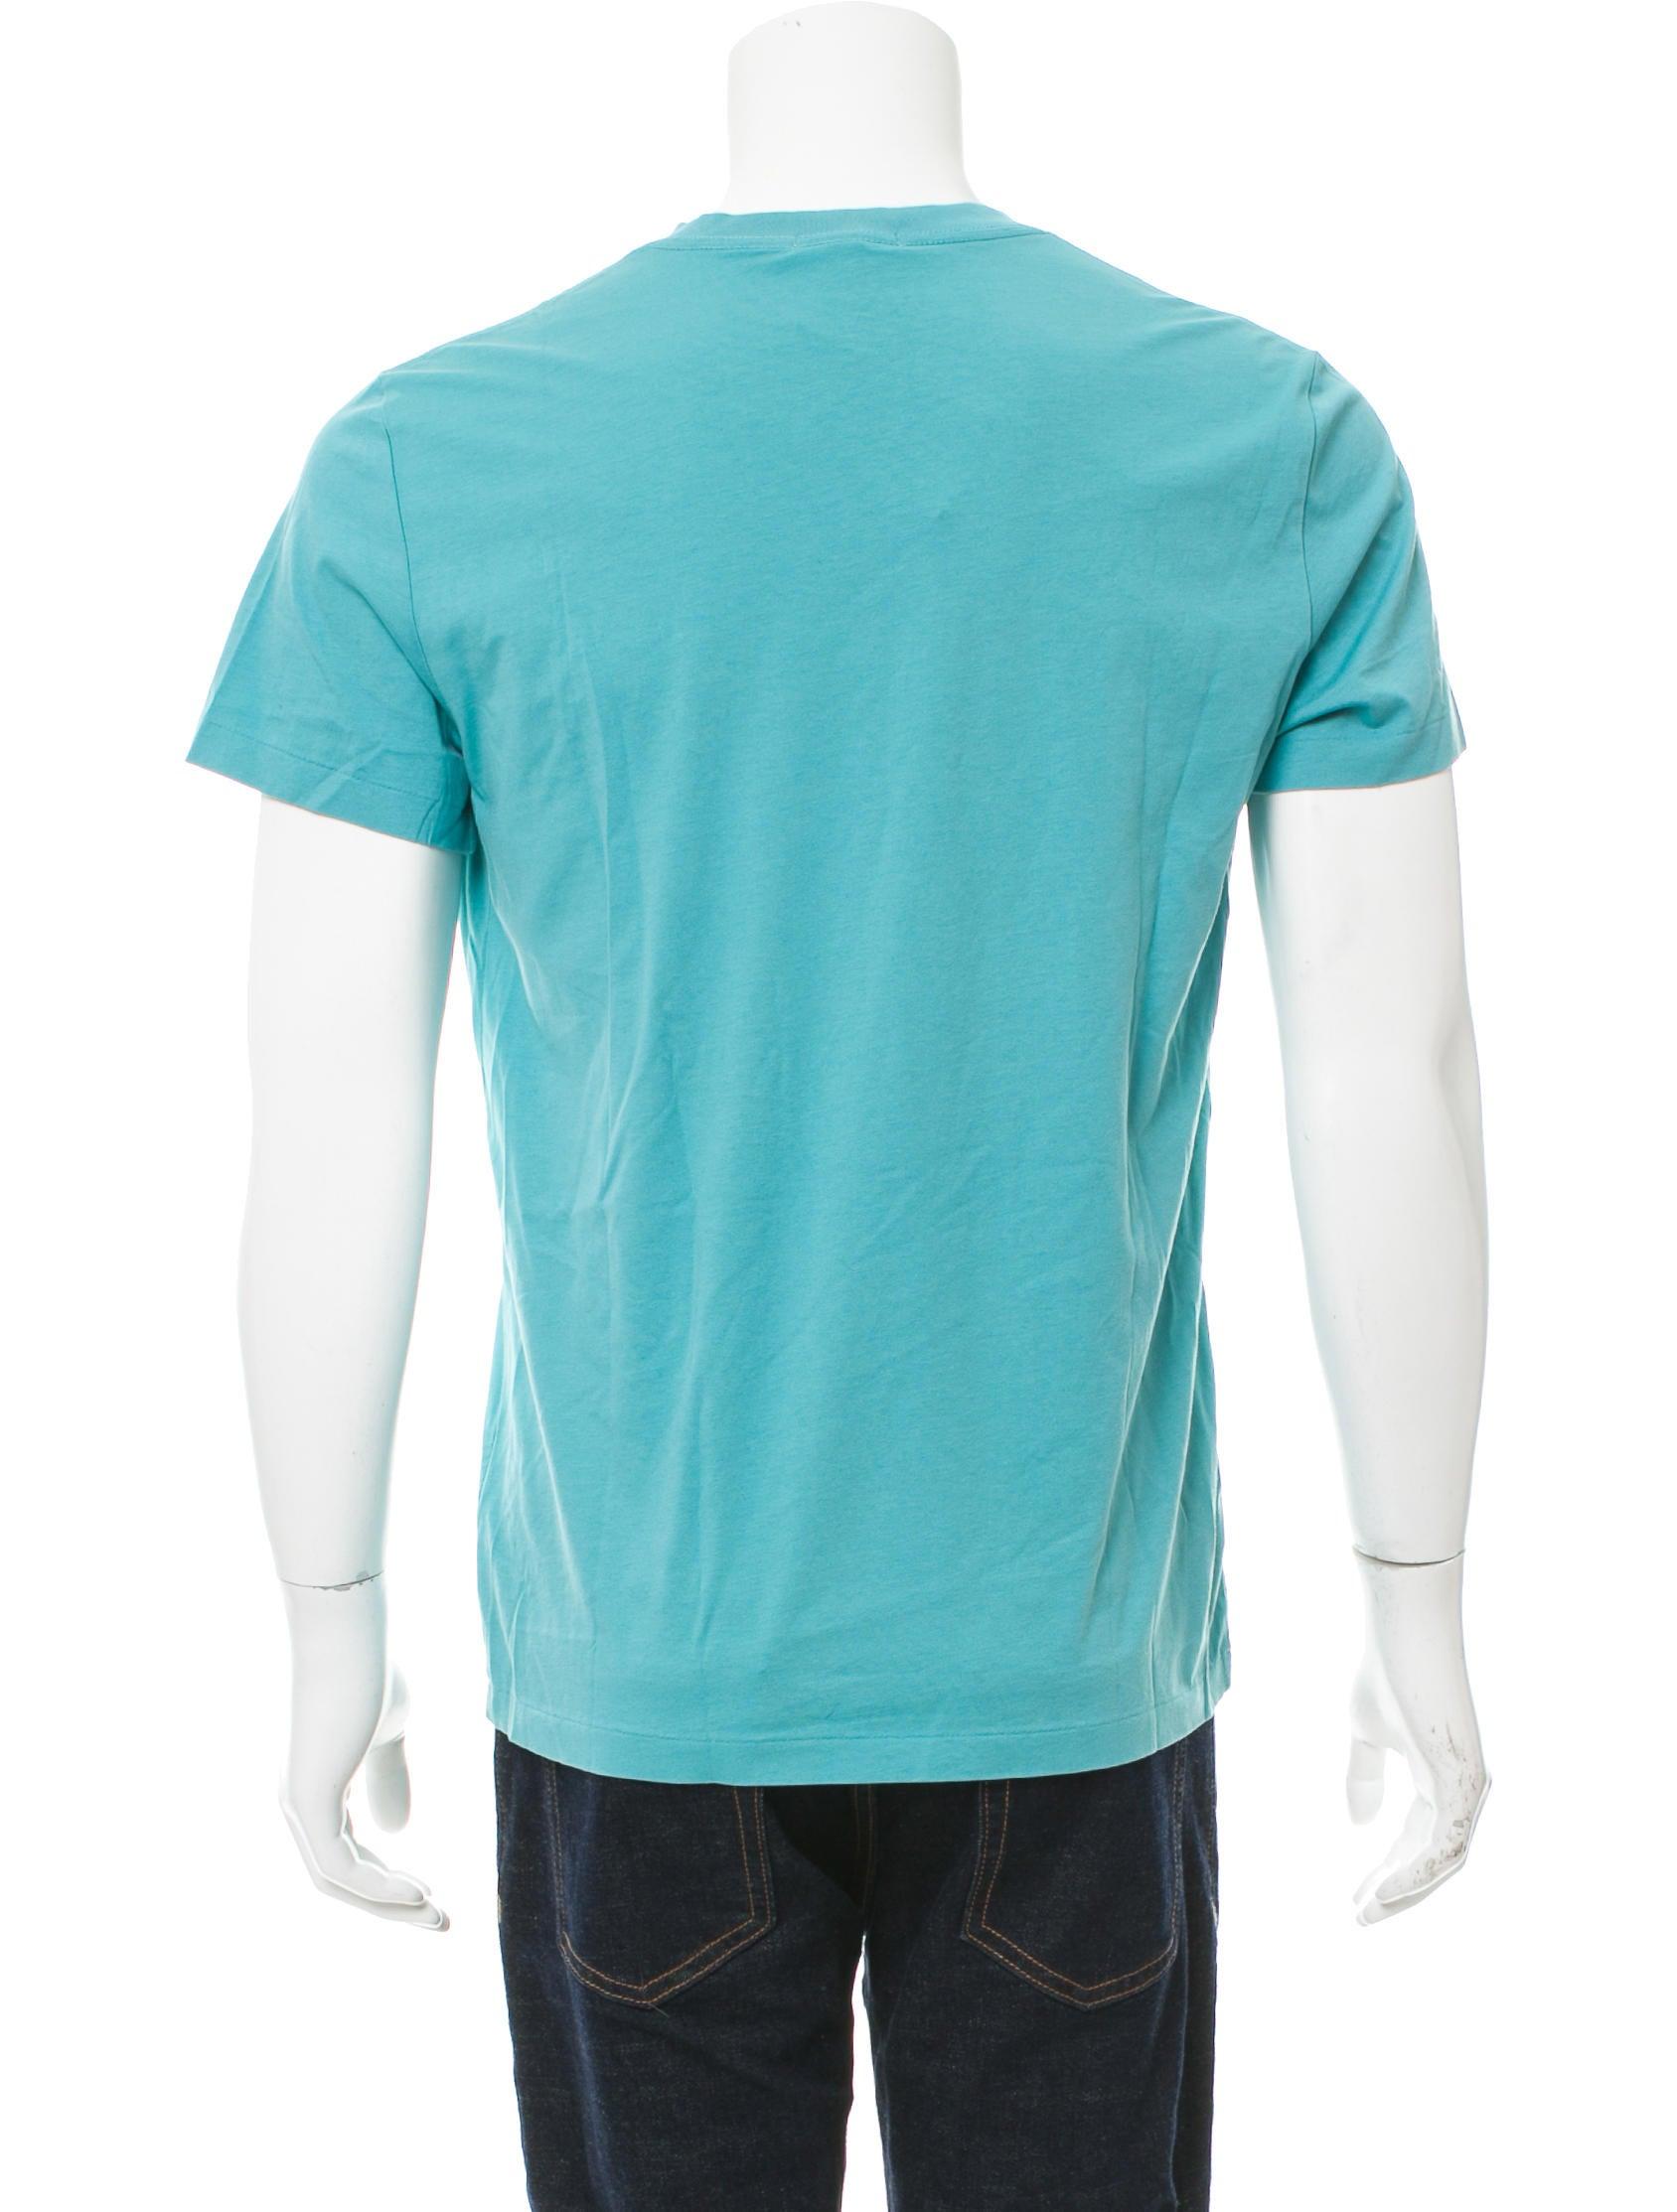 Burberry brit logo embroidered v neck t shirt clothing for Shirt with logo embroidered